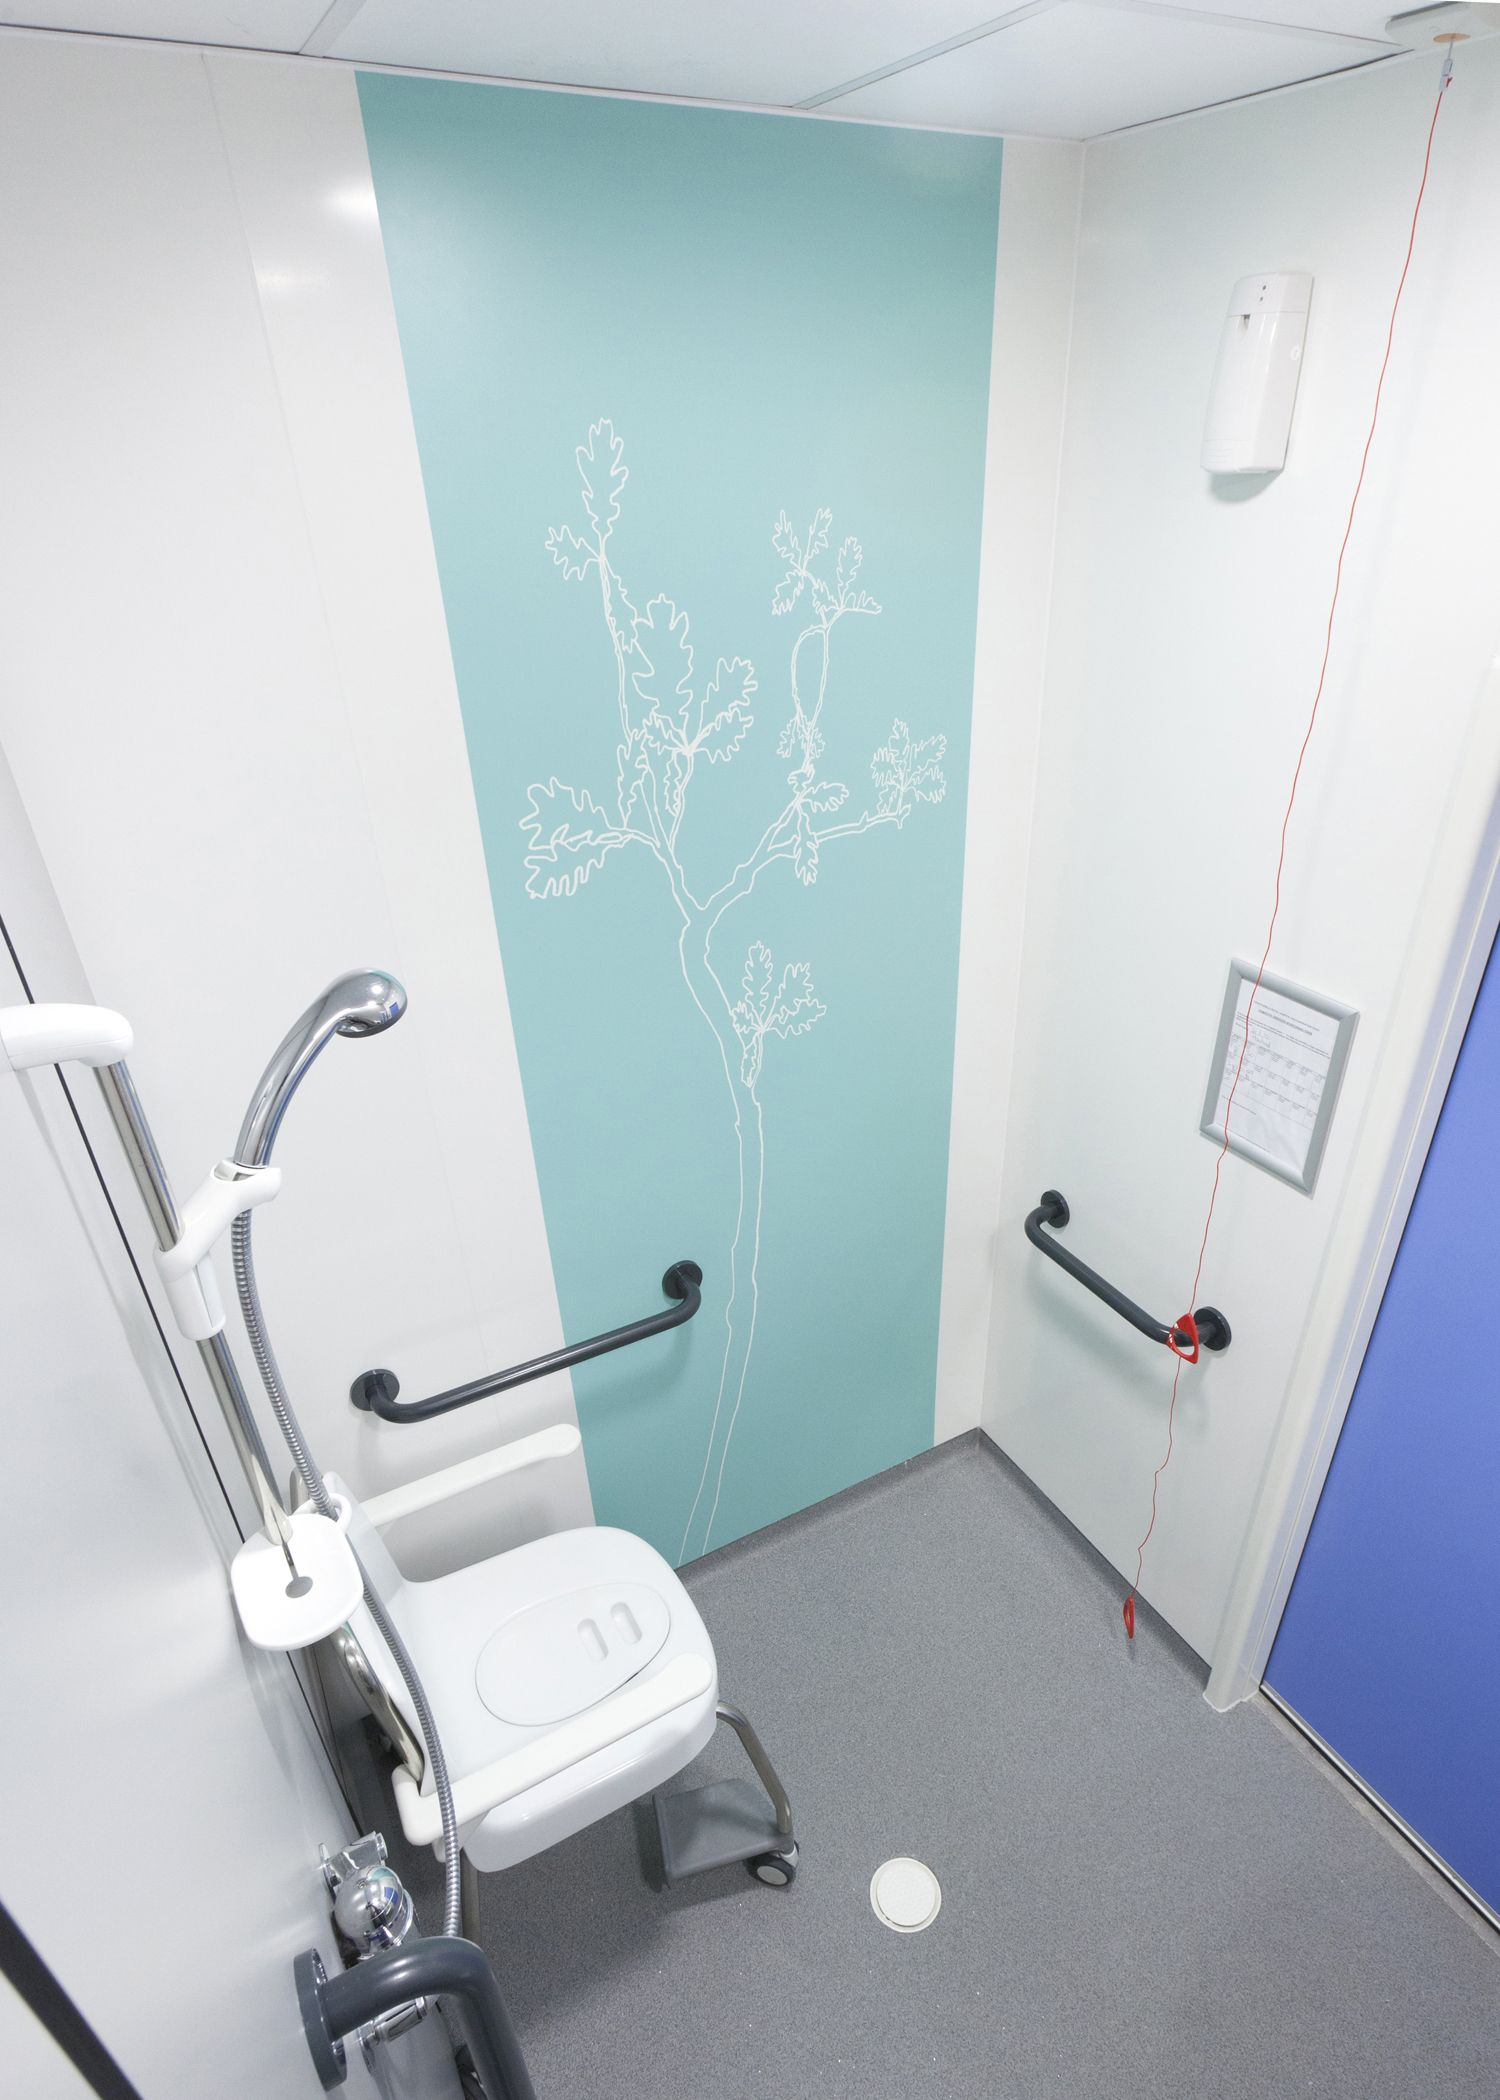 hospital bathroom. Brightening up a hospital ensuite bathroom  Line Art by Artinsite